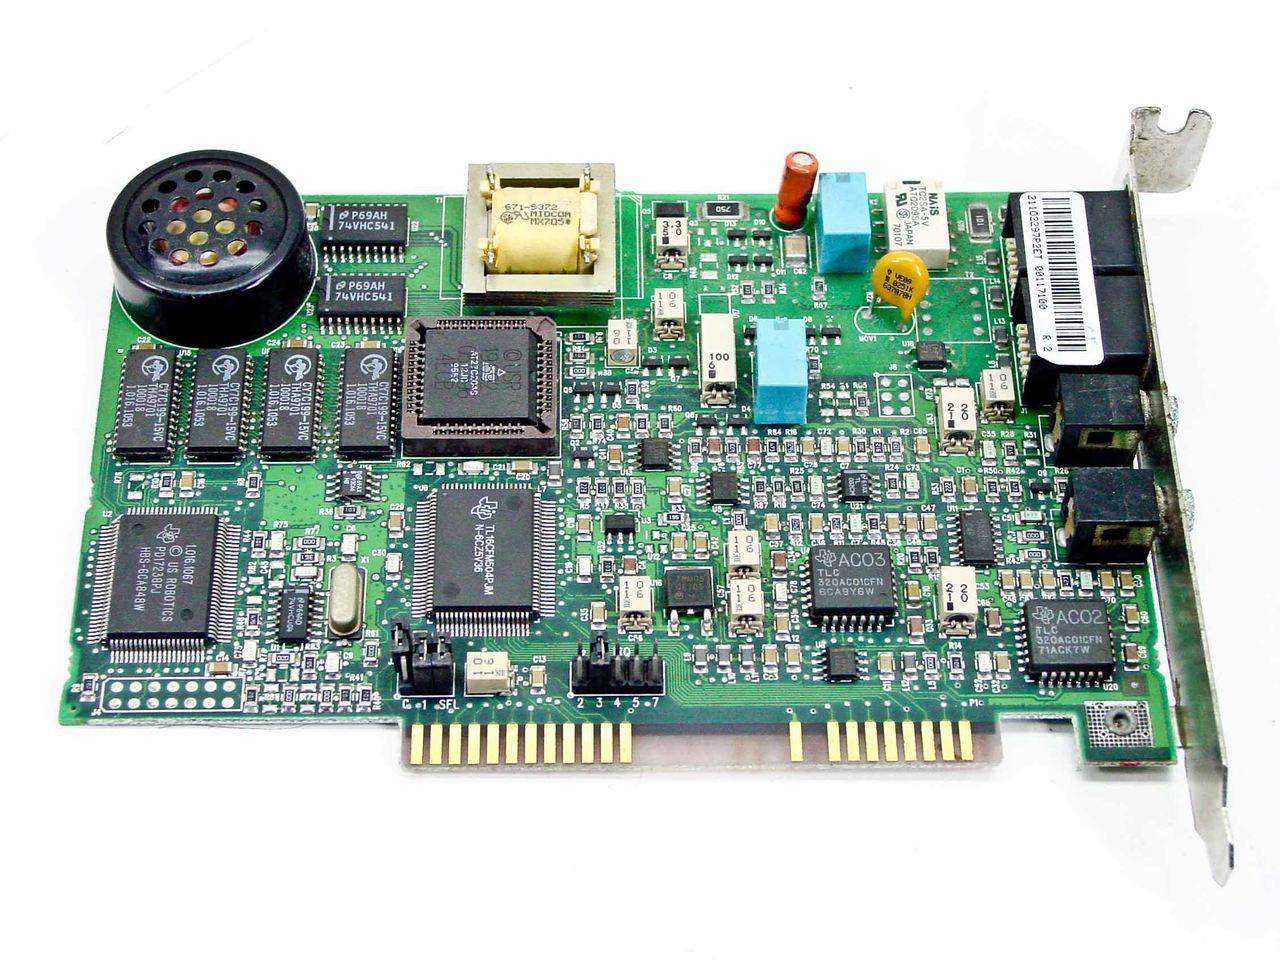 US Robotics 1.012.0374 Sportster 0374 28.k 8-bit ISA Modem 00711700   RecycledGoods.com